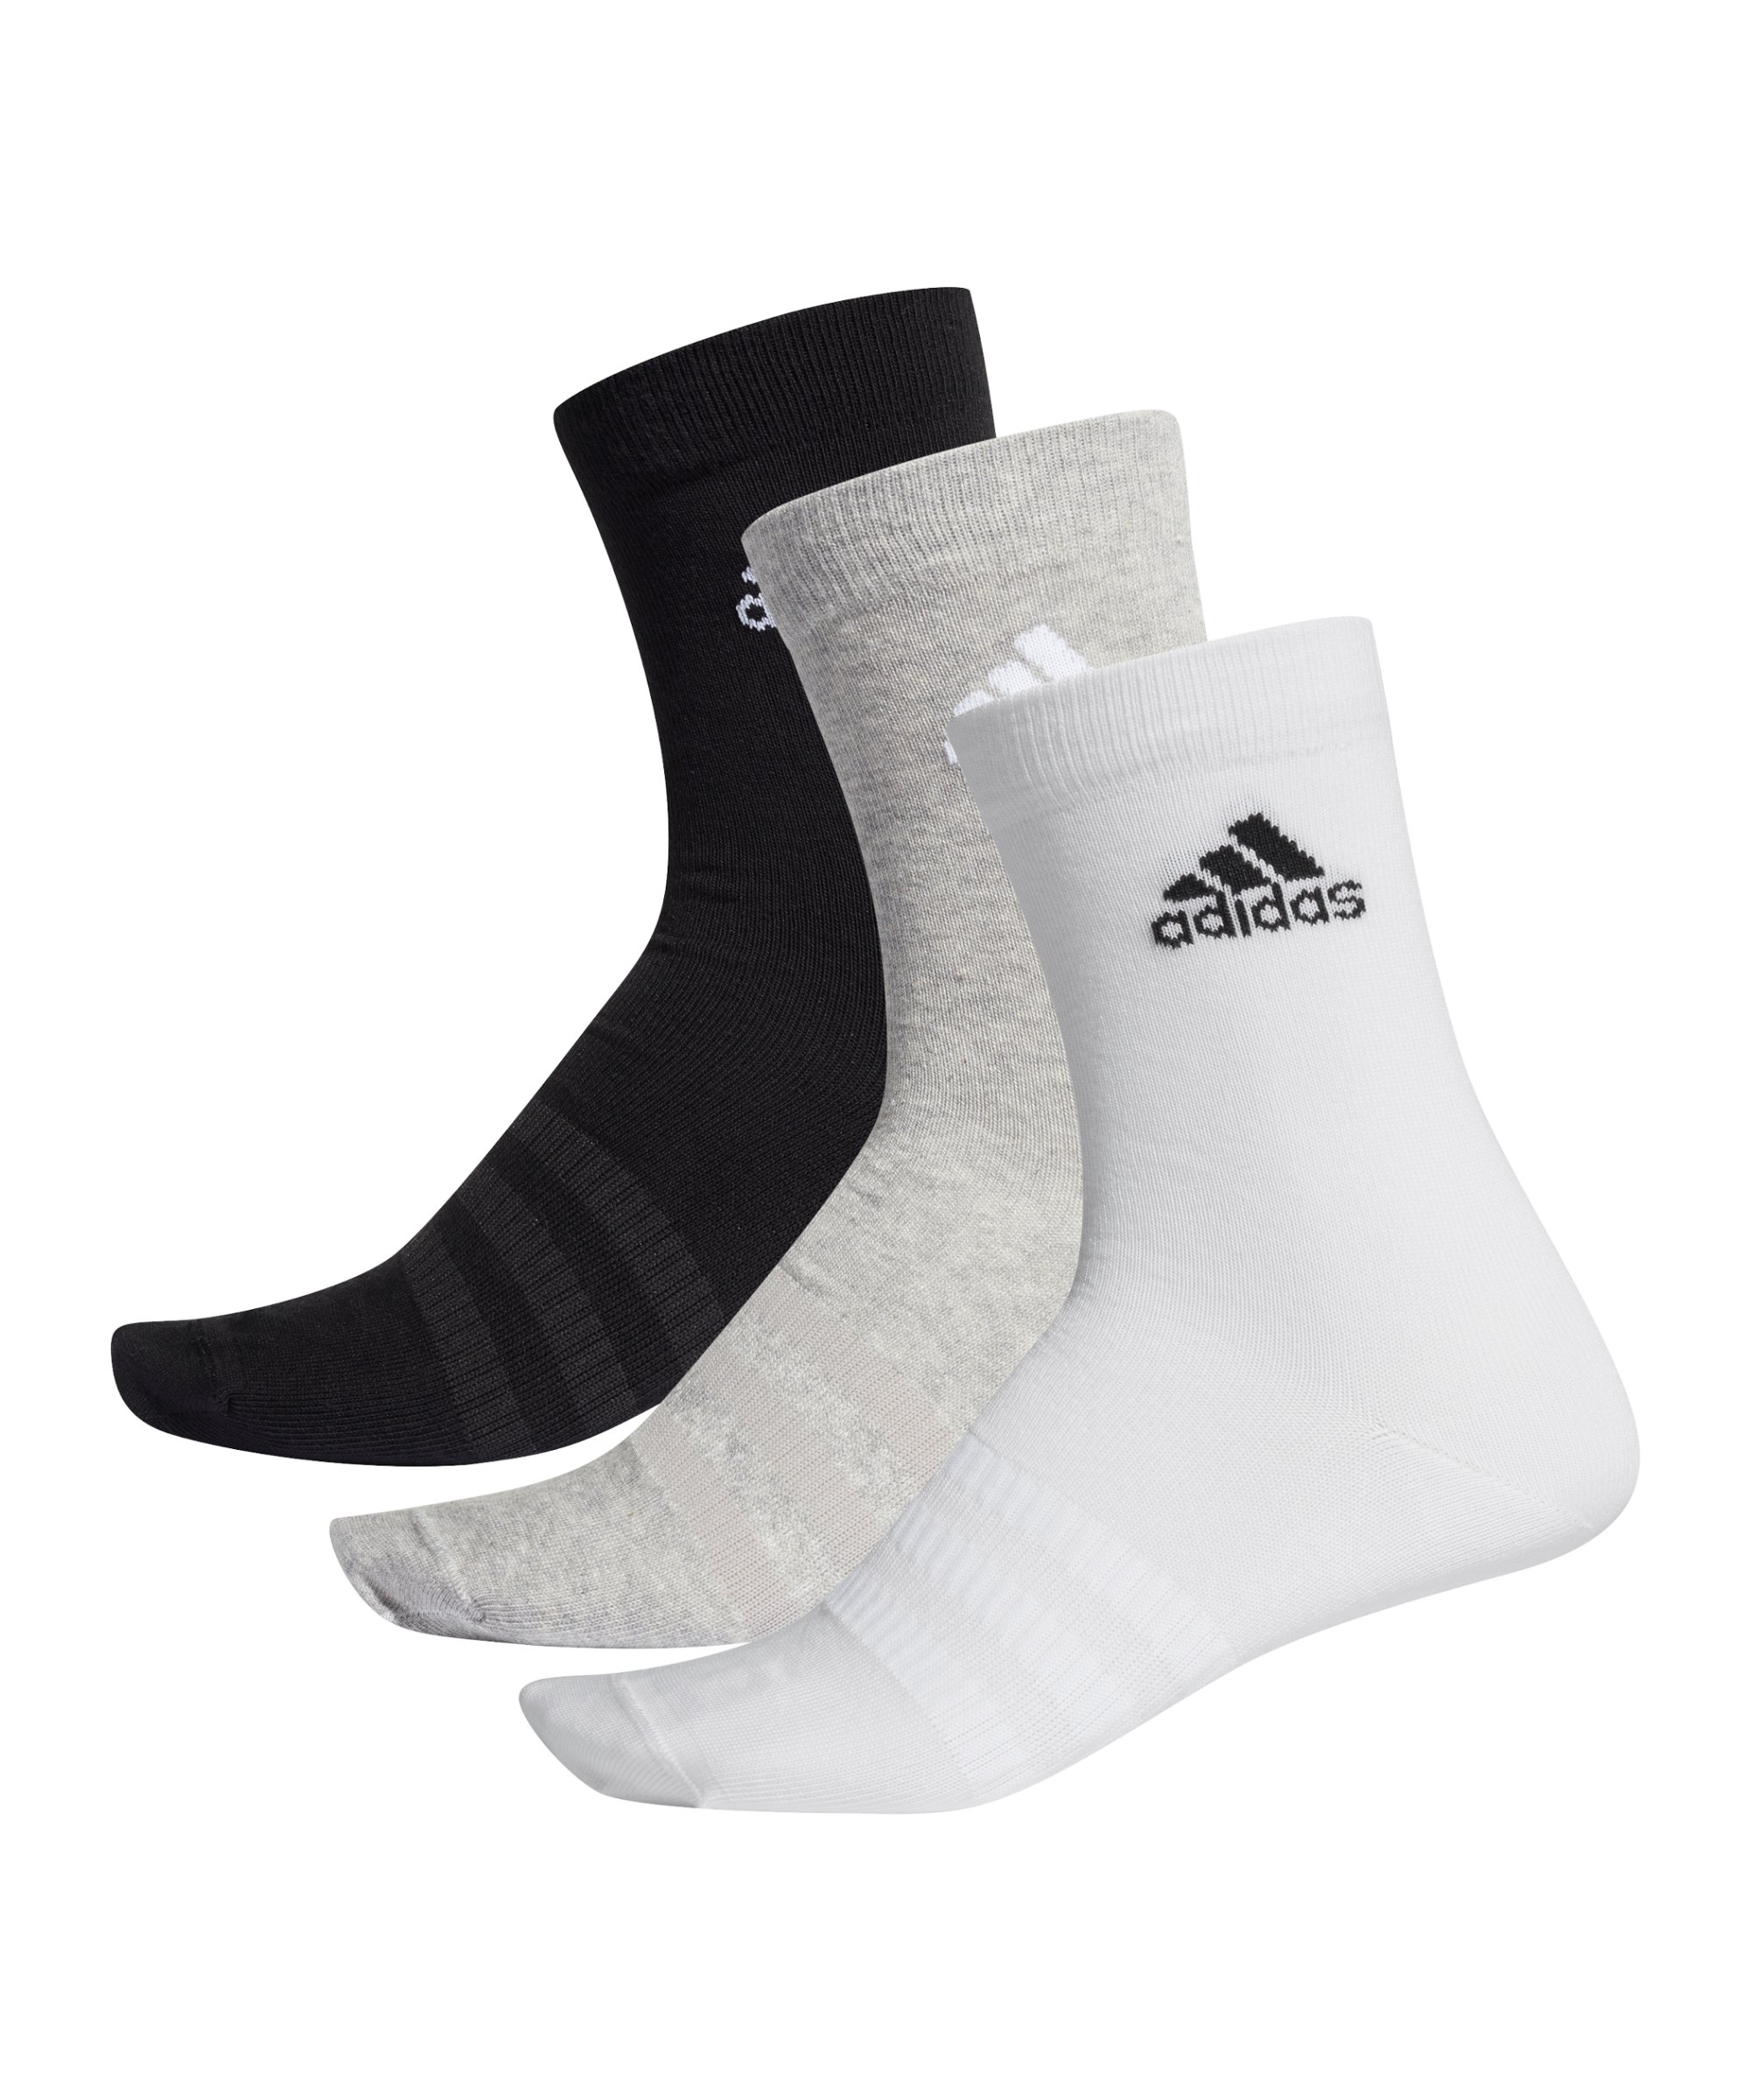 adidas Light Crew Socken 3er Pack Grau - grau